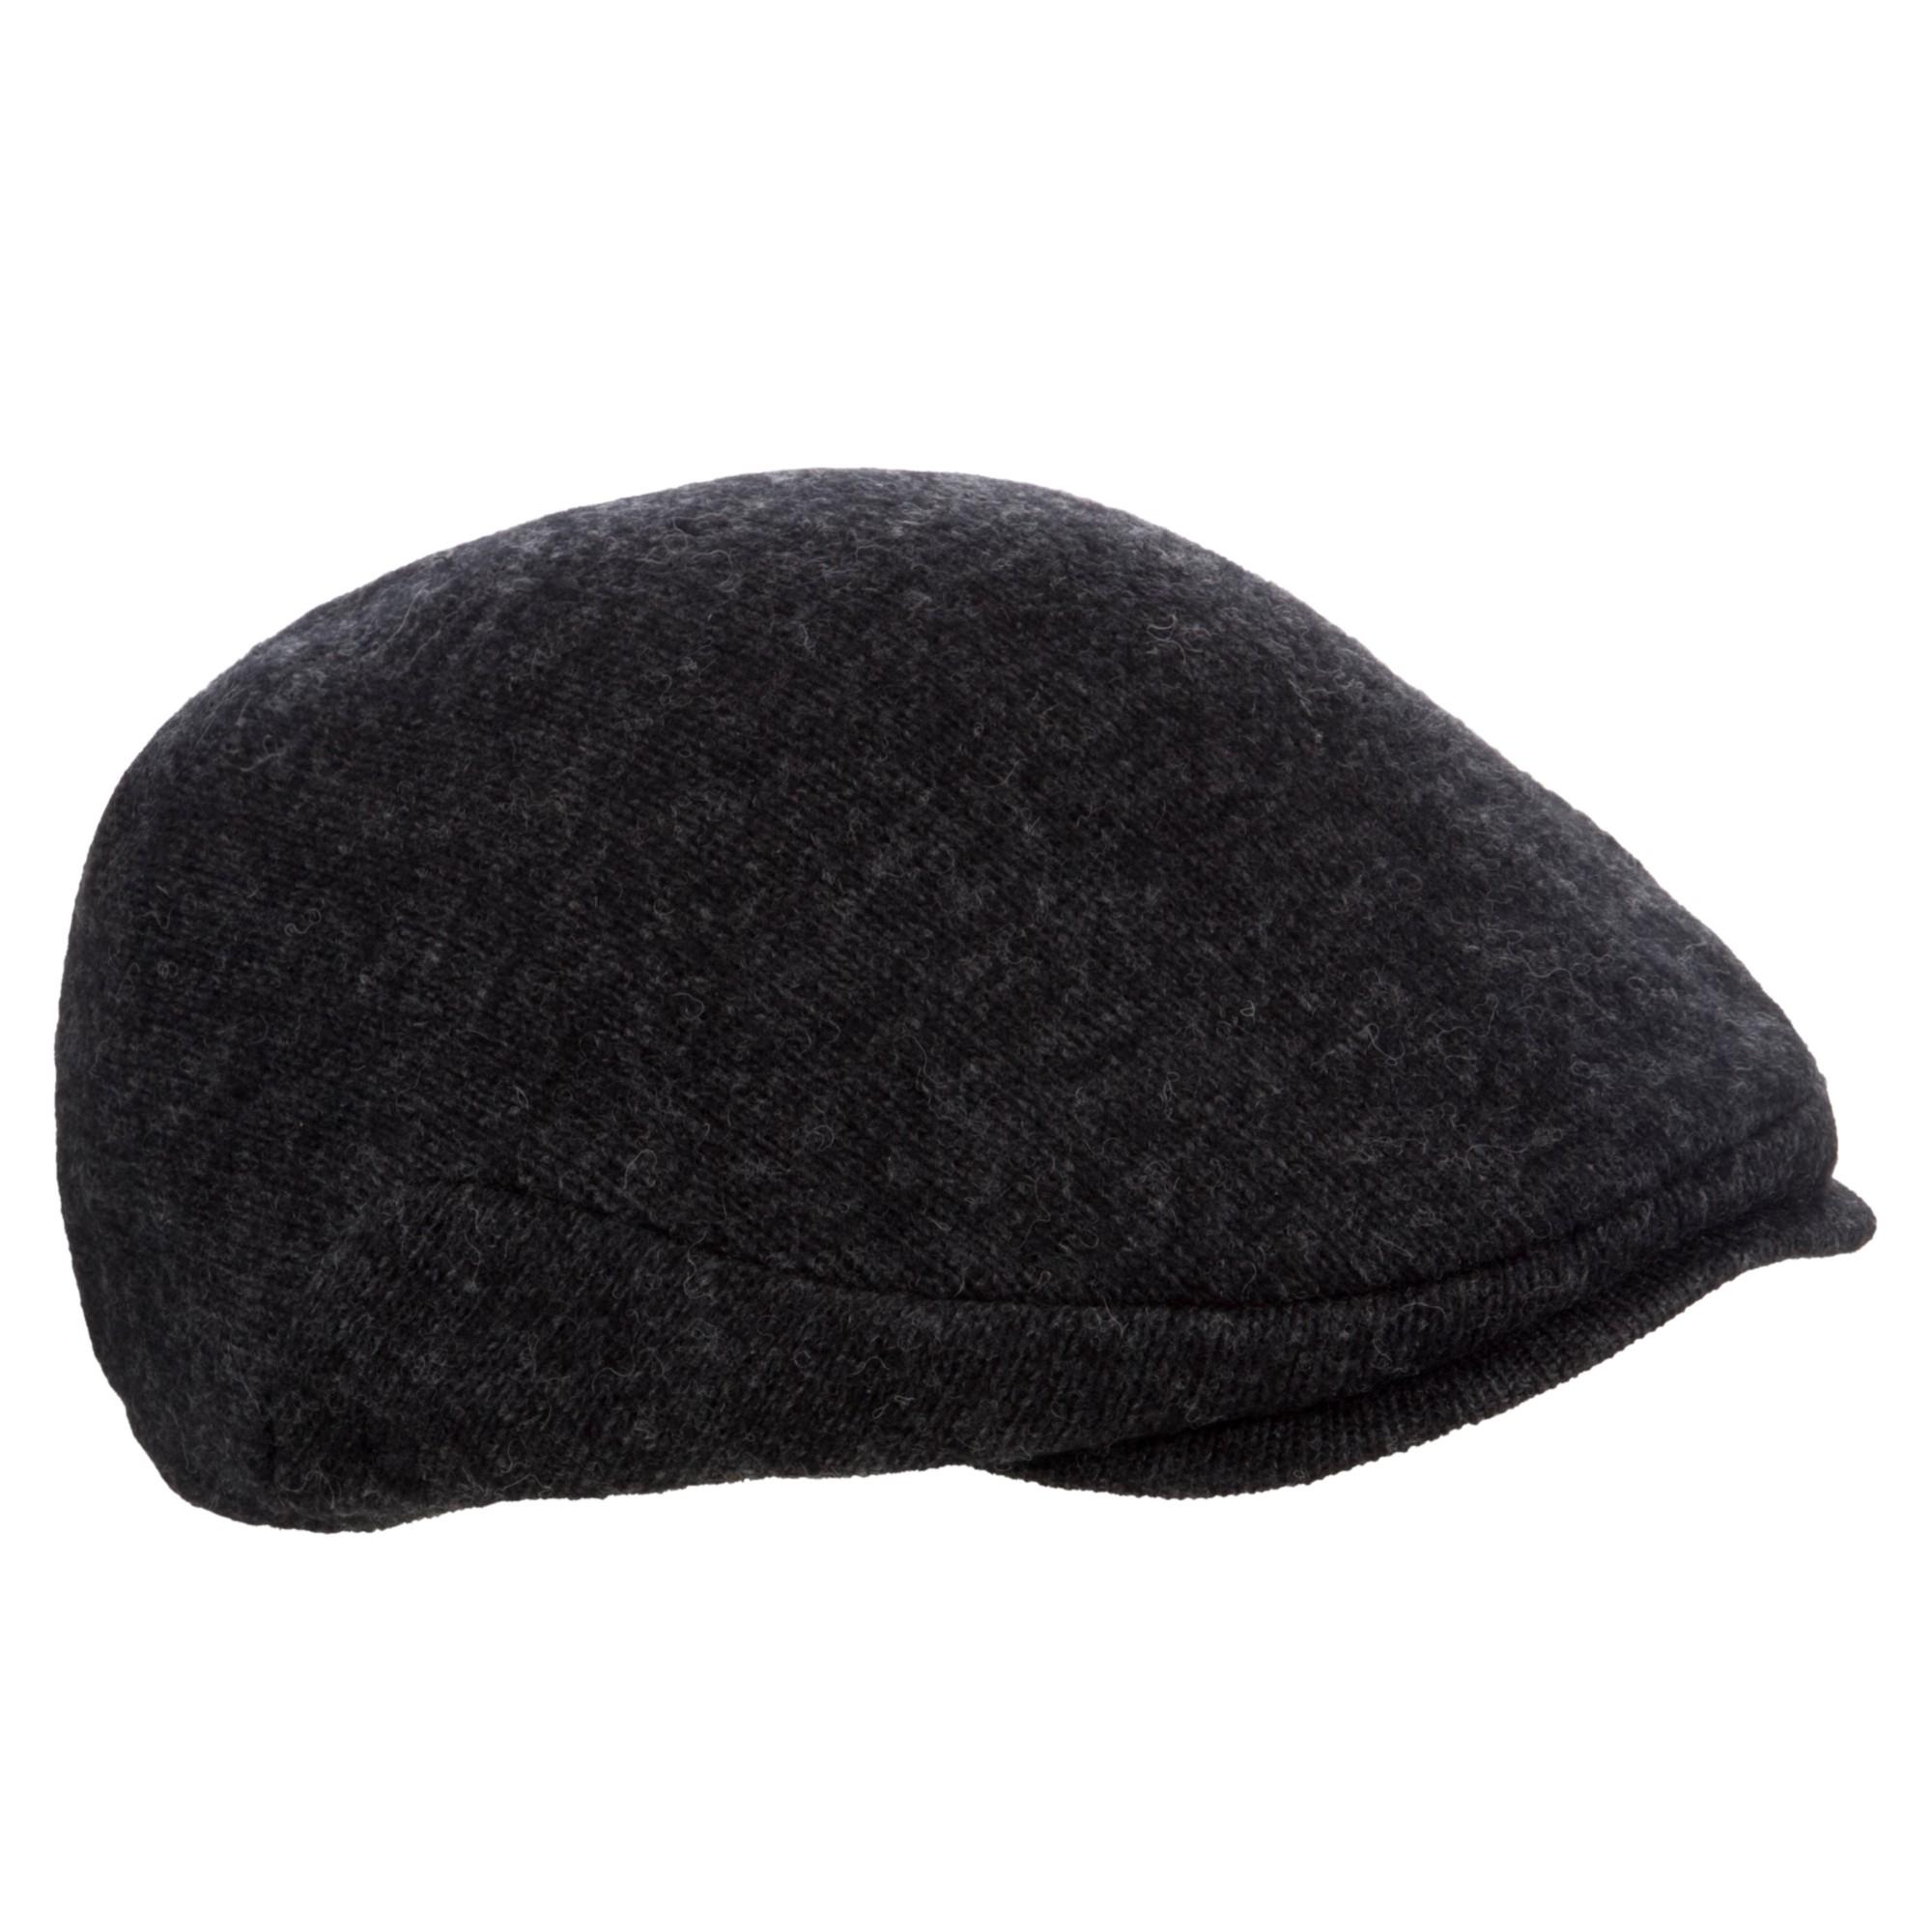 75ba4eeb7 Polo Ralph Lauren Wool Blend Flat Cap in Gray for Men - Lyst